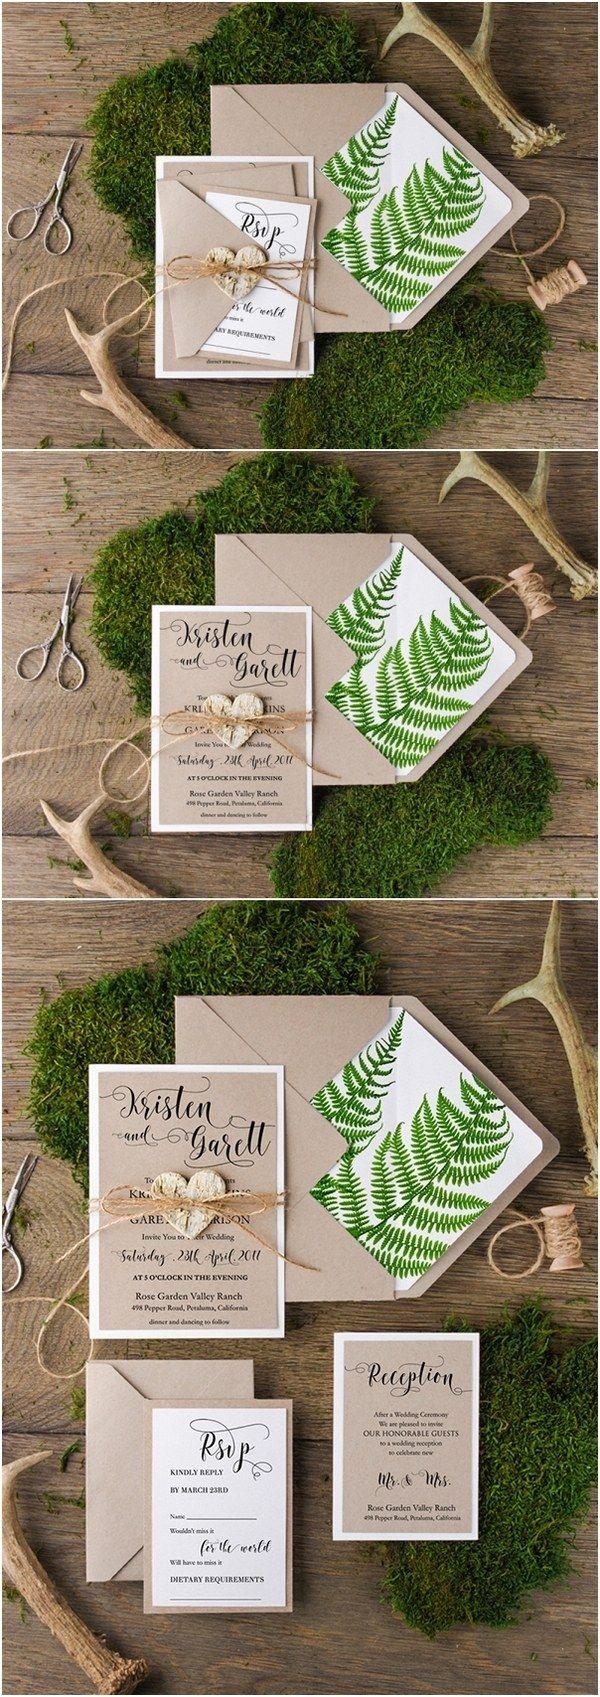 Rustic country botanical green wedding invitations / http://www.deerpearlflowers.com/rustic-wedding-guest-books-botanical-wedding-invitations/